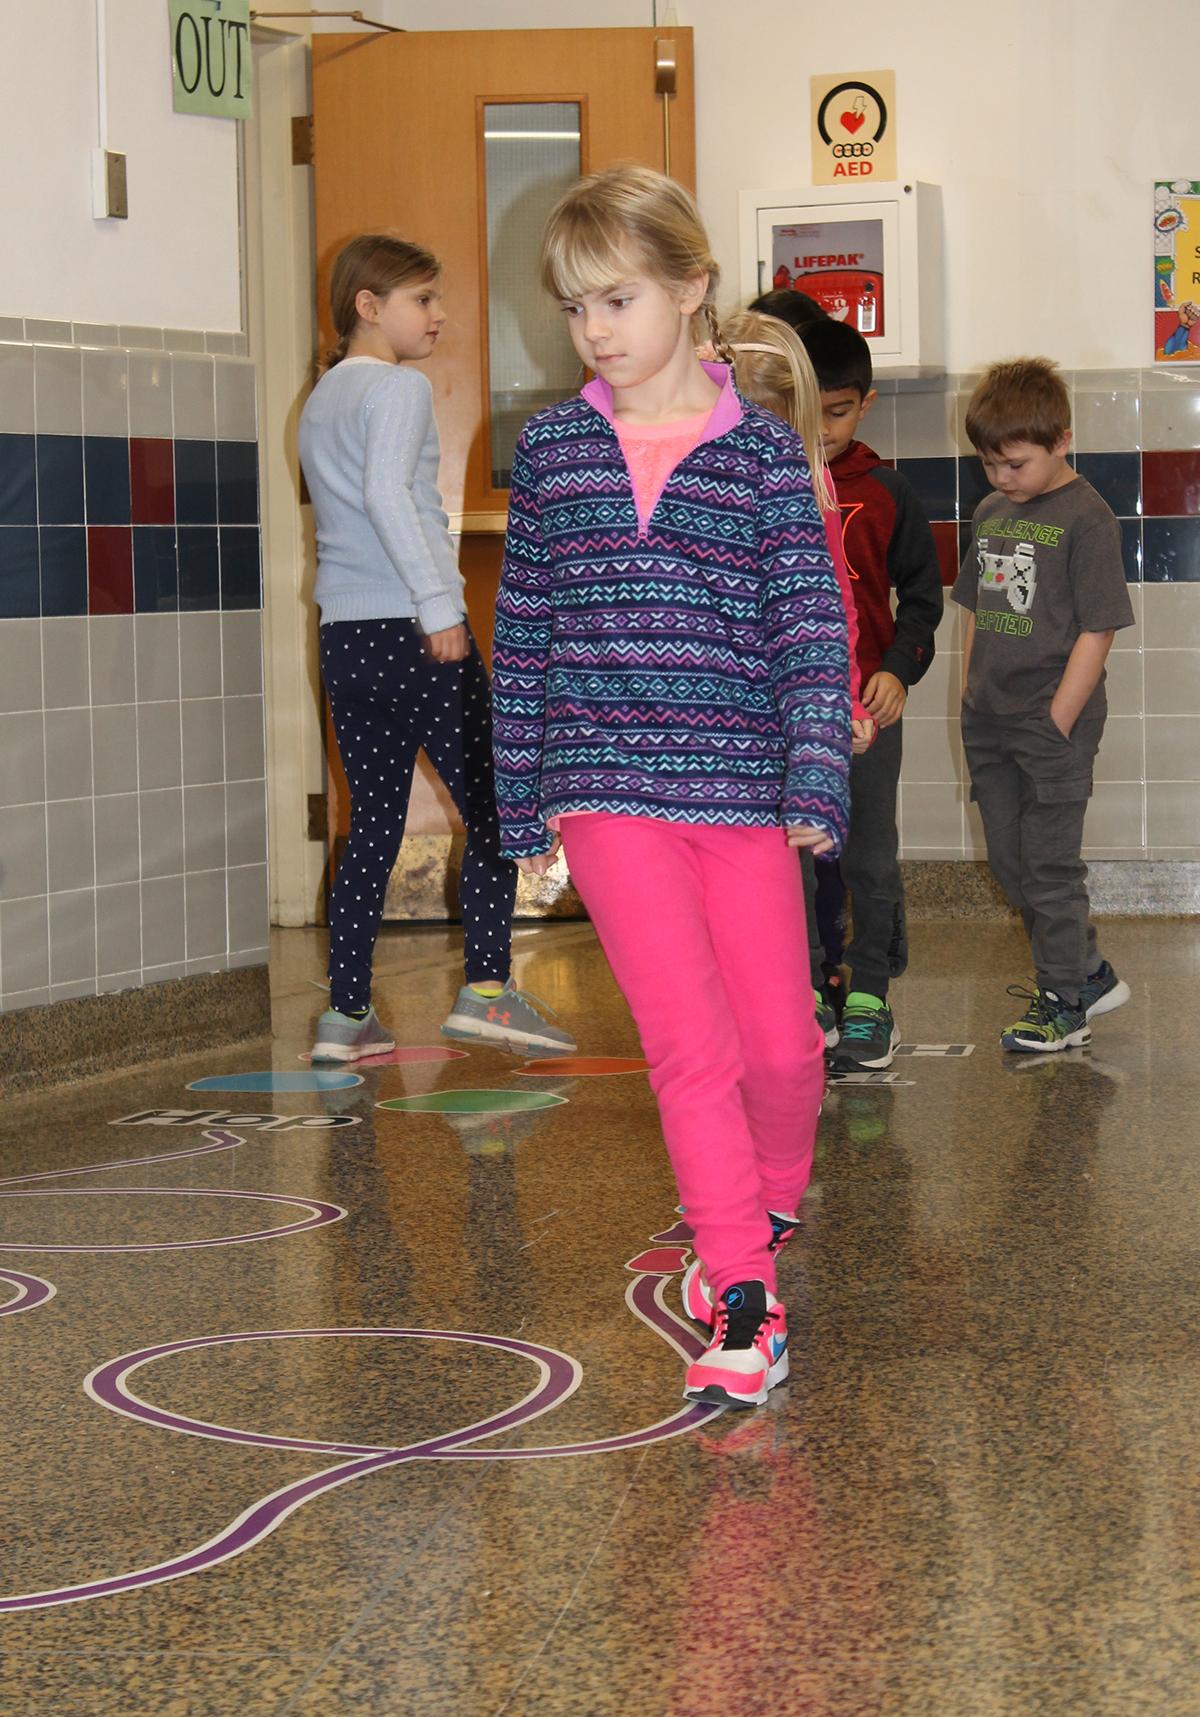 Students walking on sticker path in hallway.